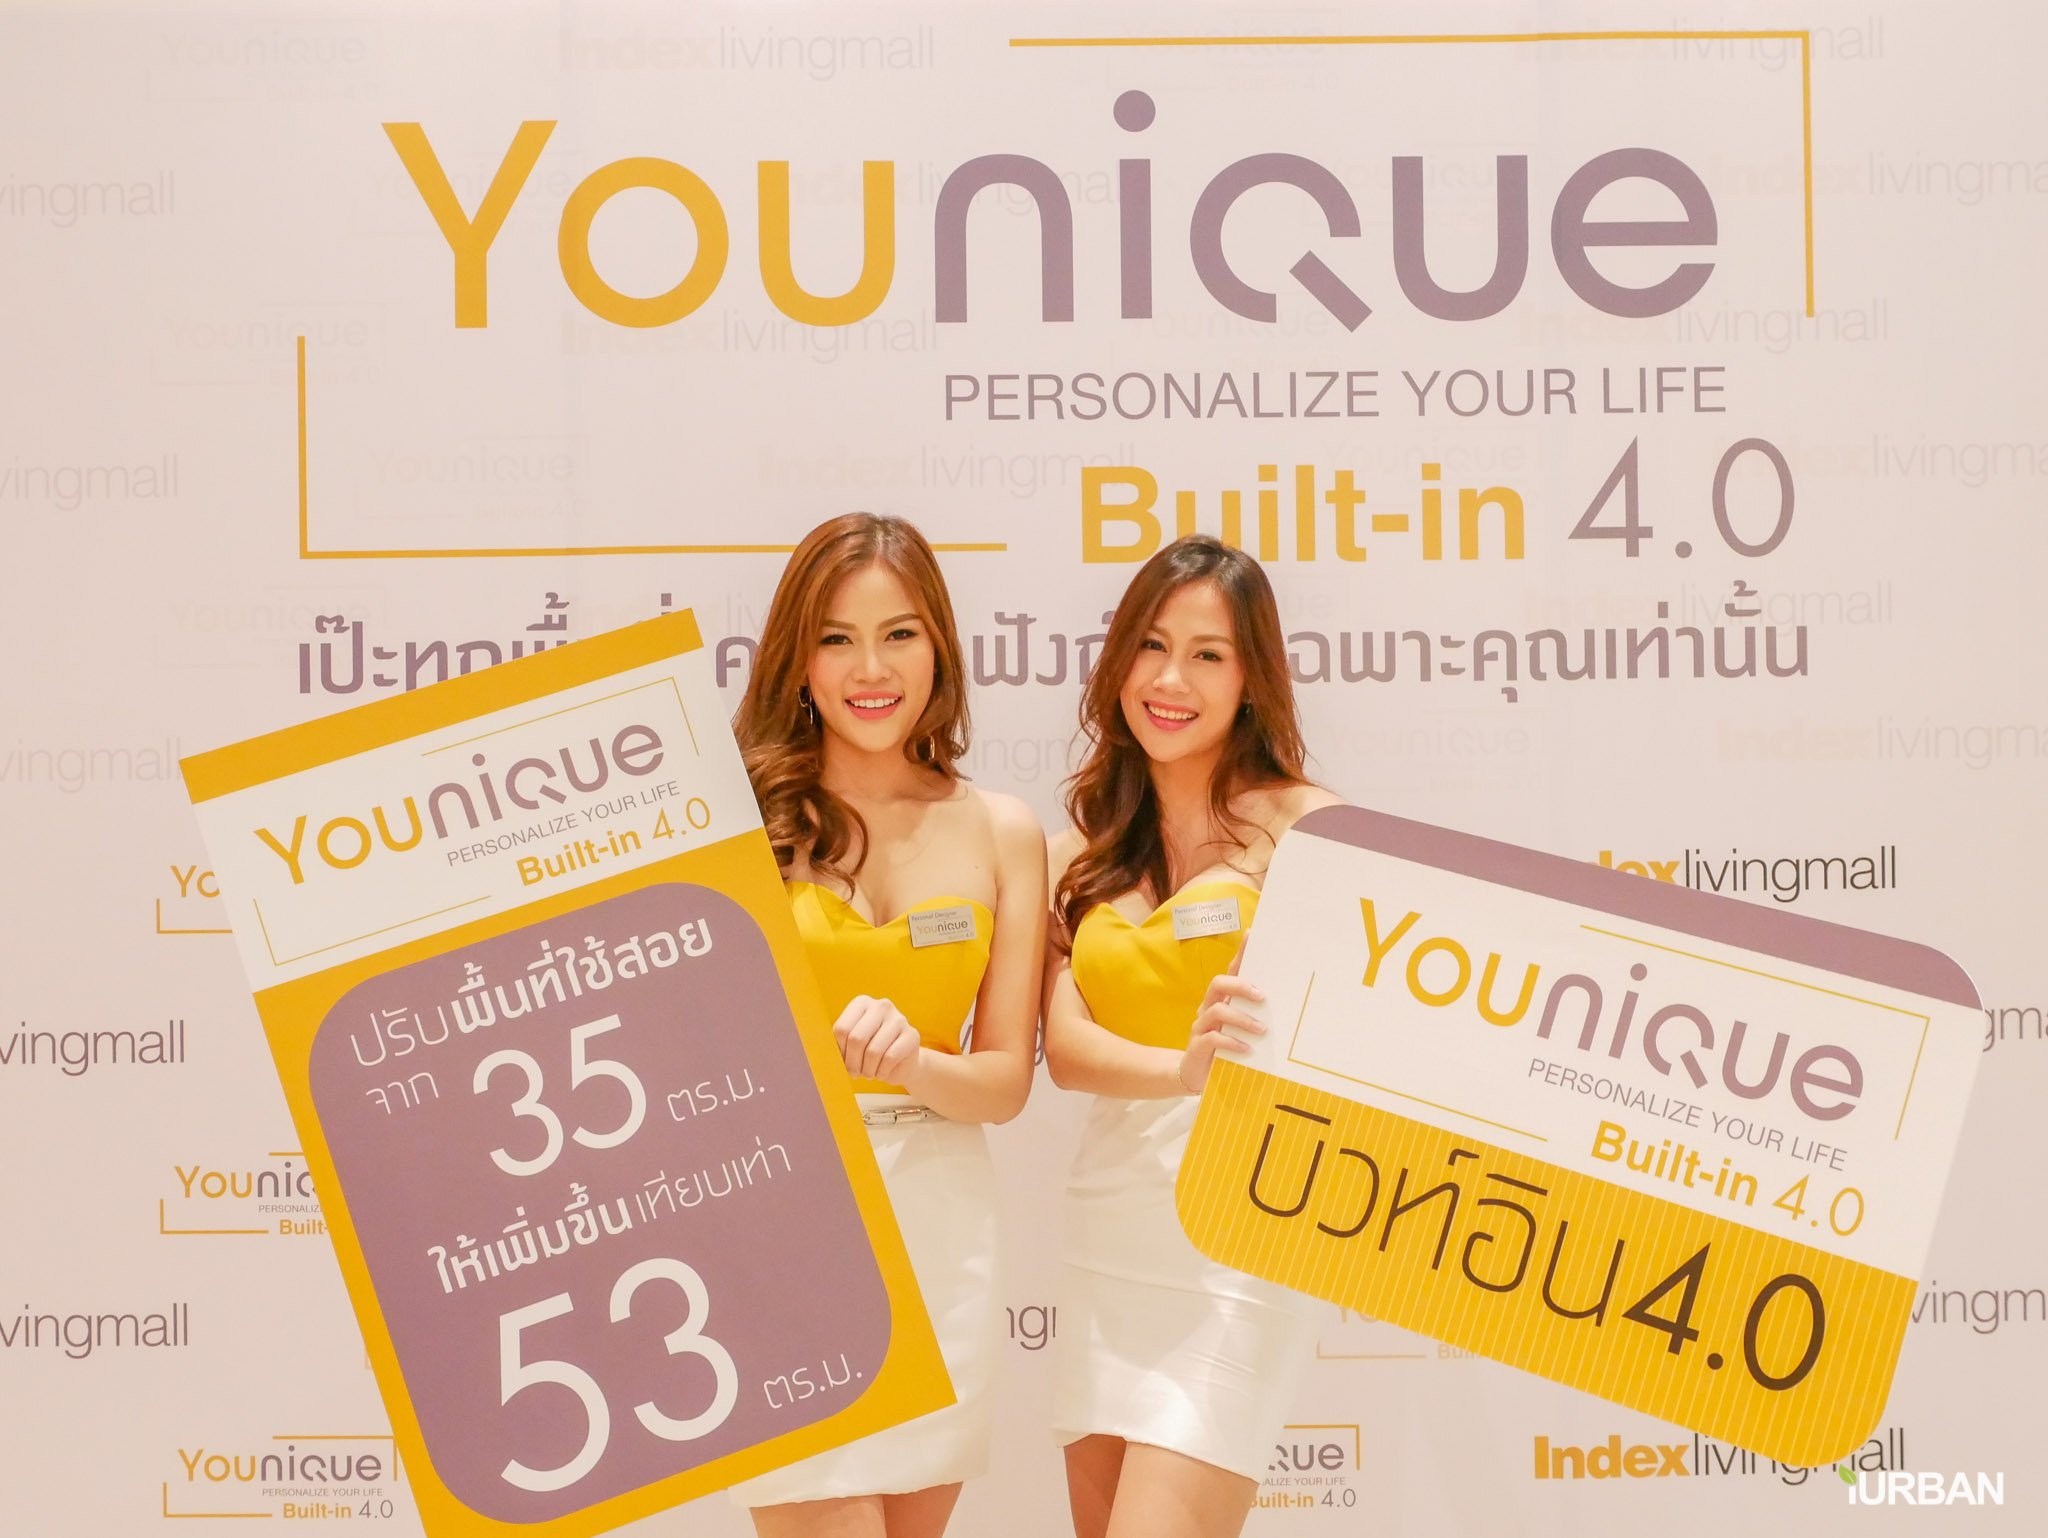 Younique เทคโนโลยีบิวท์อิน 4.0 ครั้งแรกในไทย มีเป็นล้านดีไซน์ รู้ราคาใน 1 นาที โดย Index Livingmall 46 - Built-in